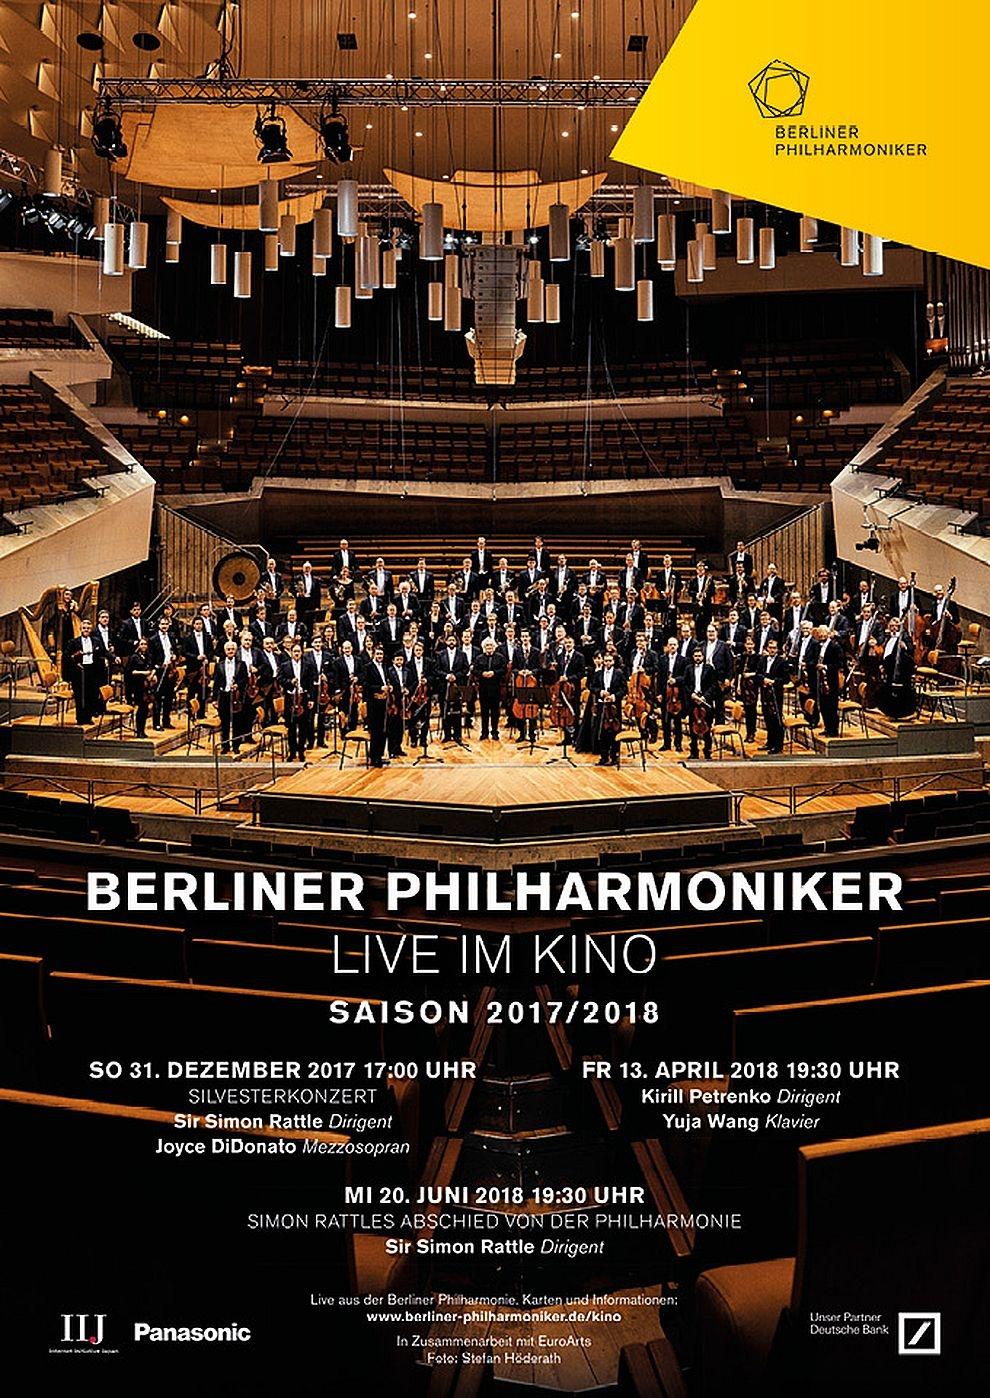 Berliner Philharmoniker Silvesterkonzert 2017 (Poster)